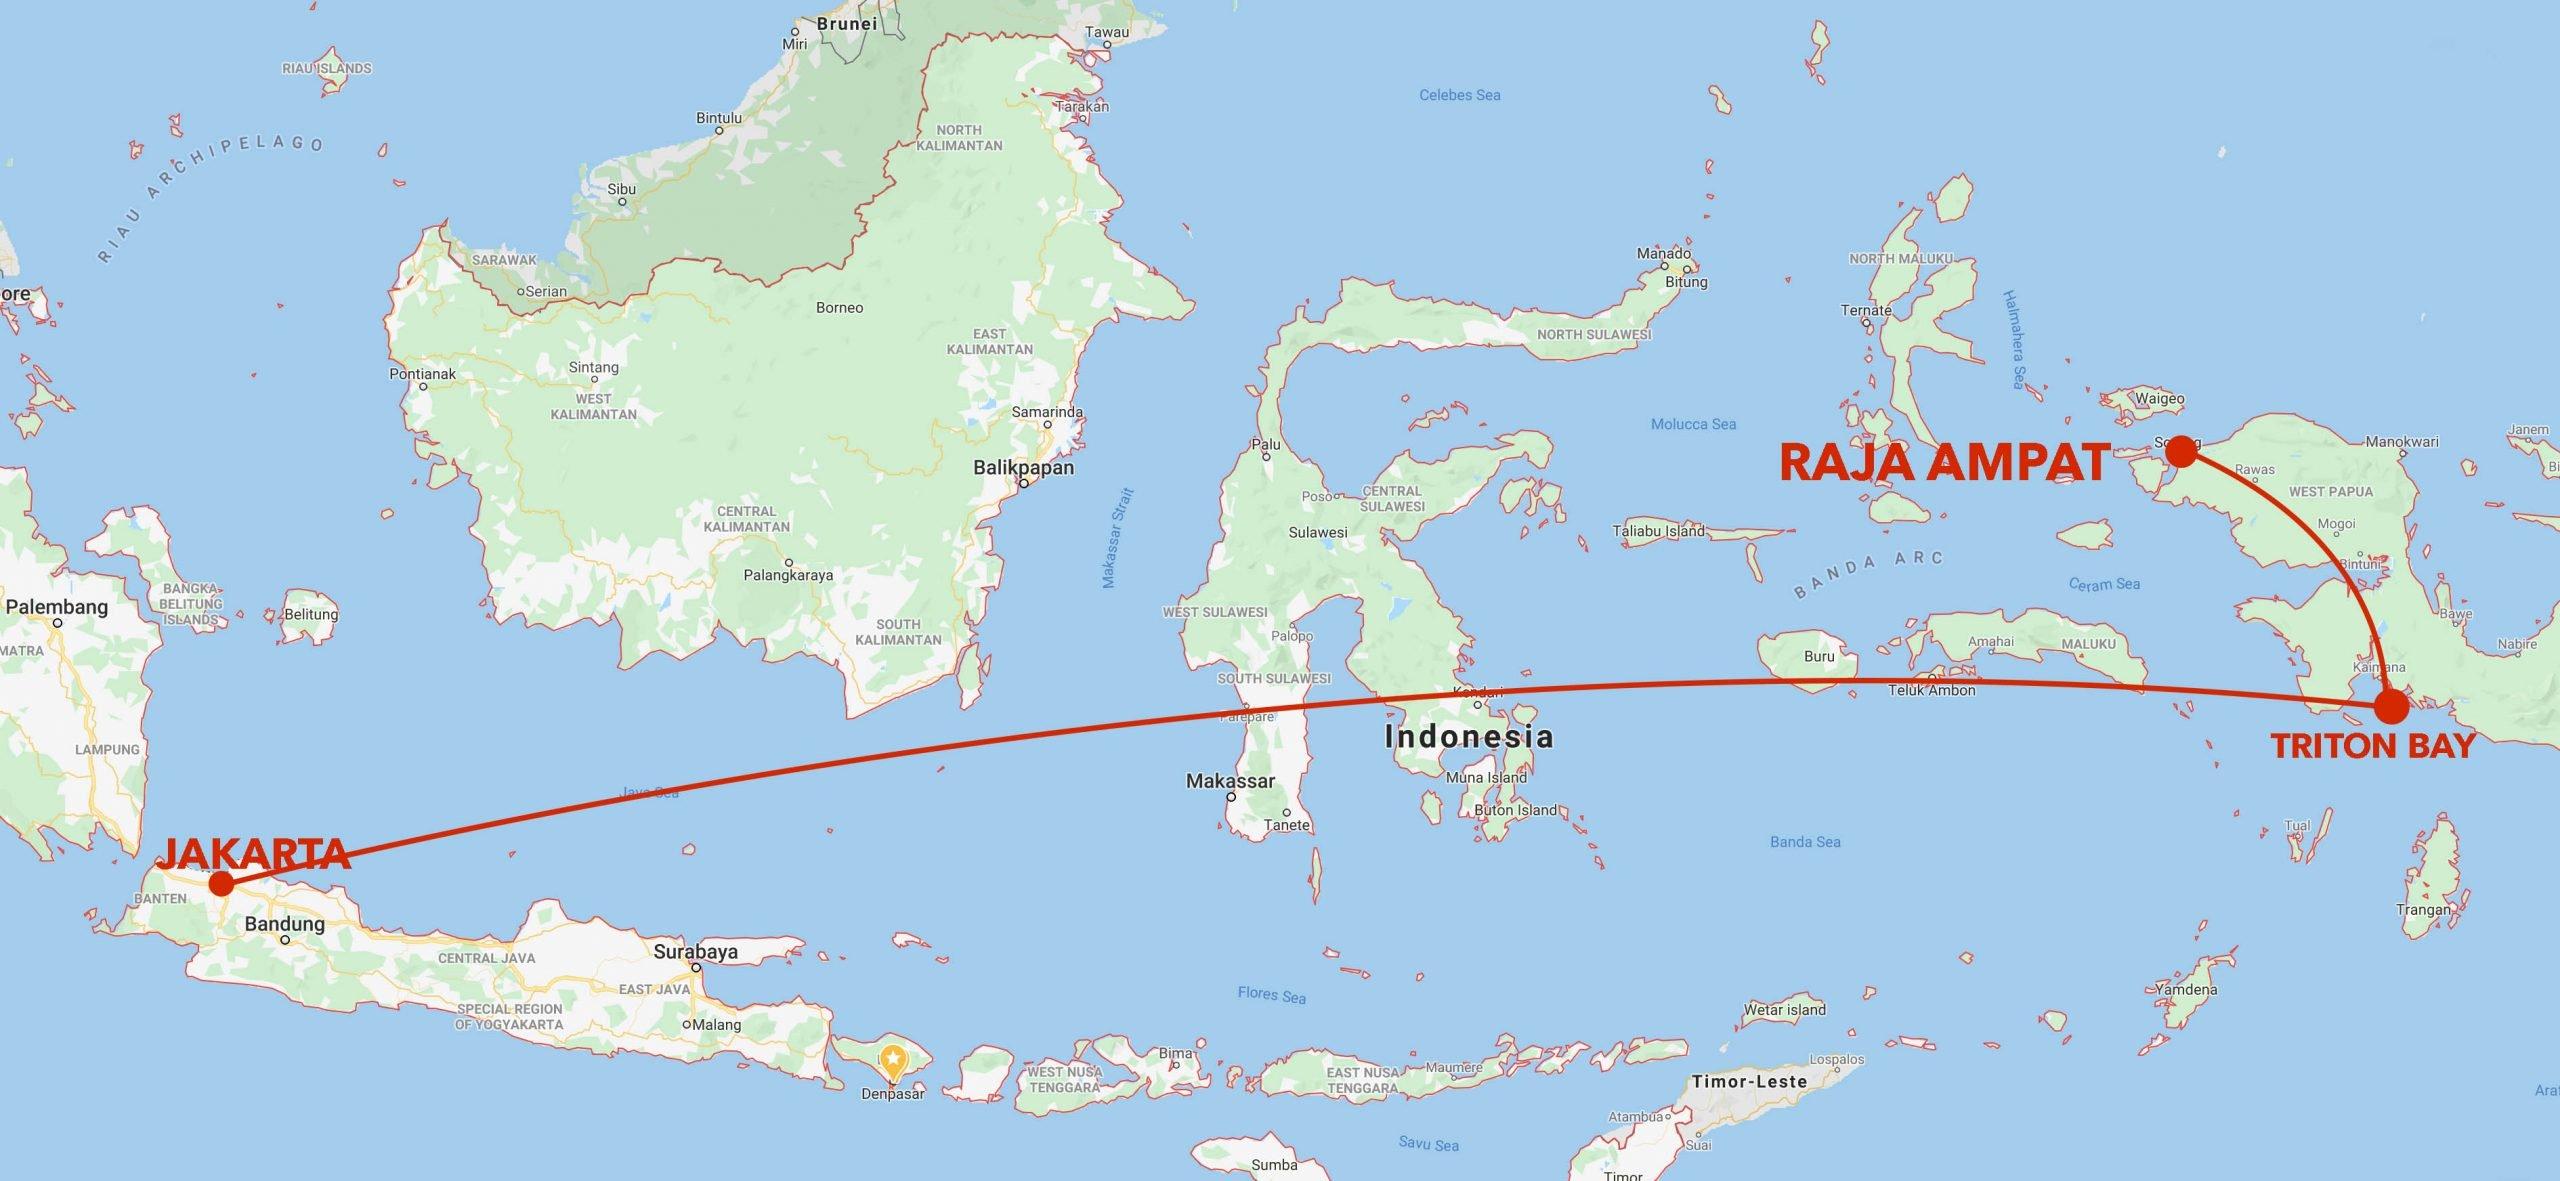 Triton Bay to Raja Ampat snorkel safari itinerary map